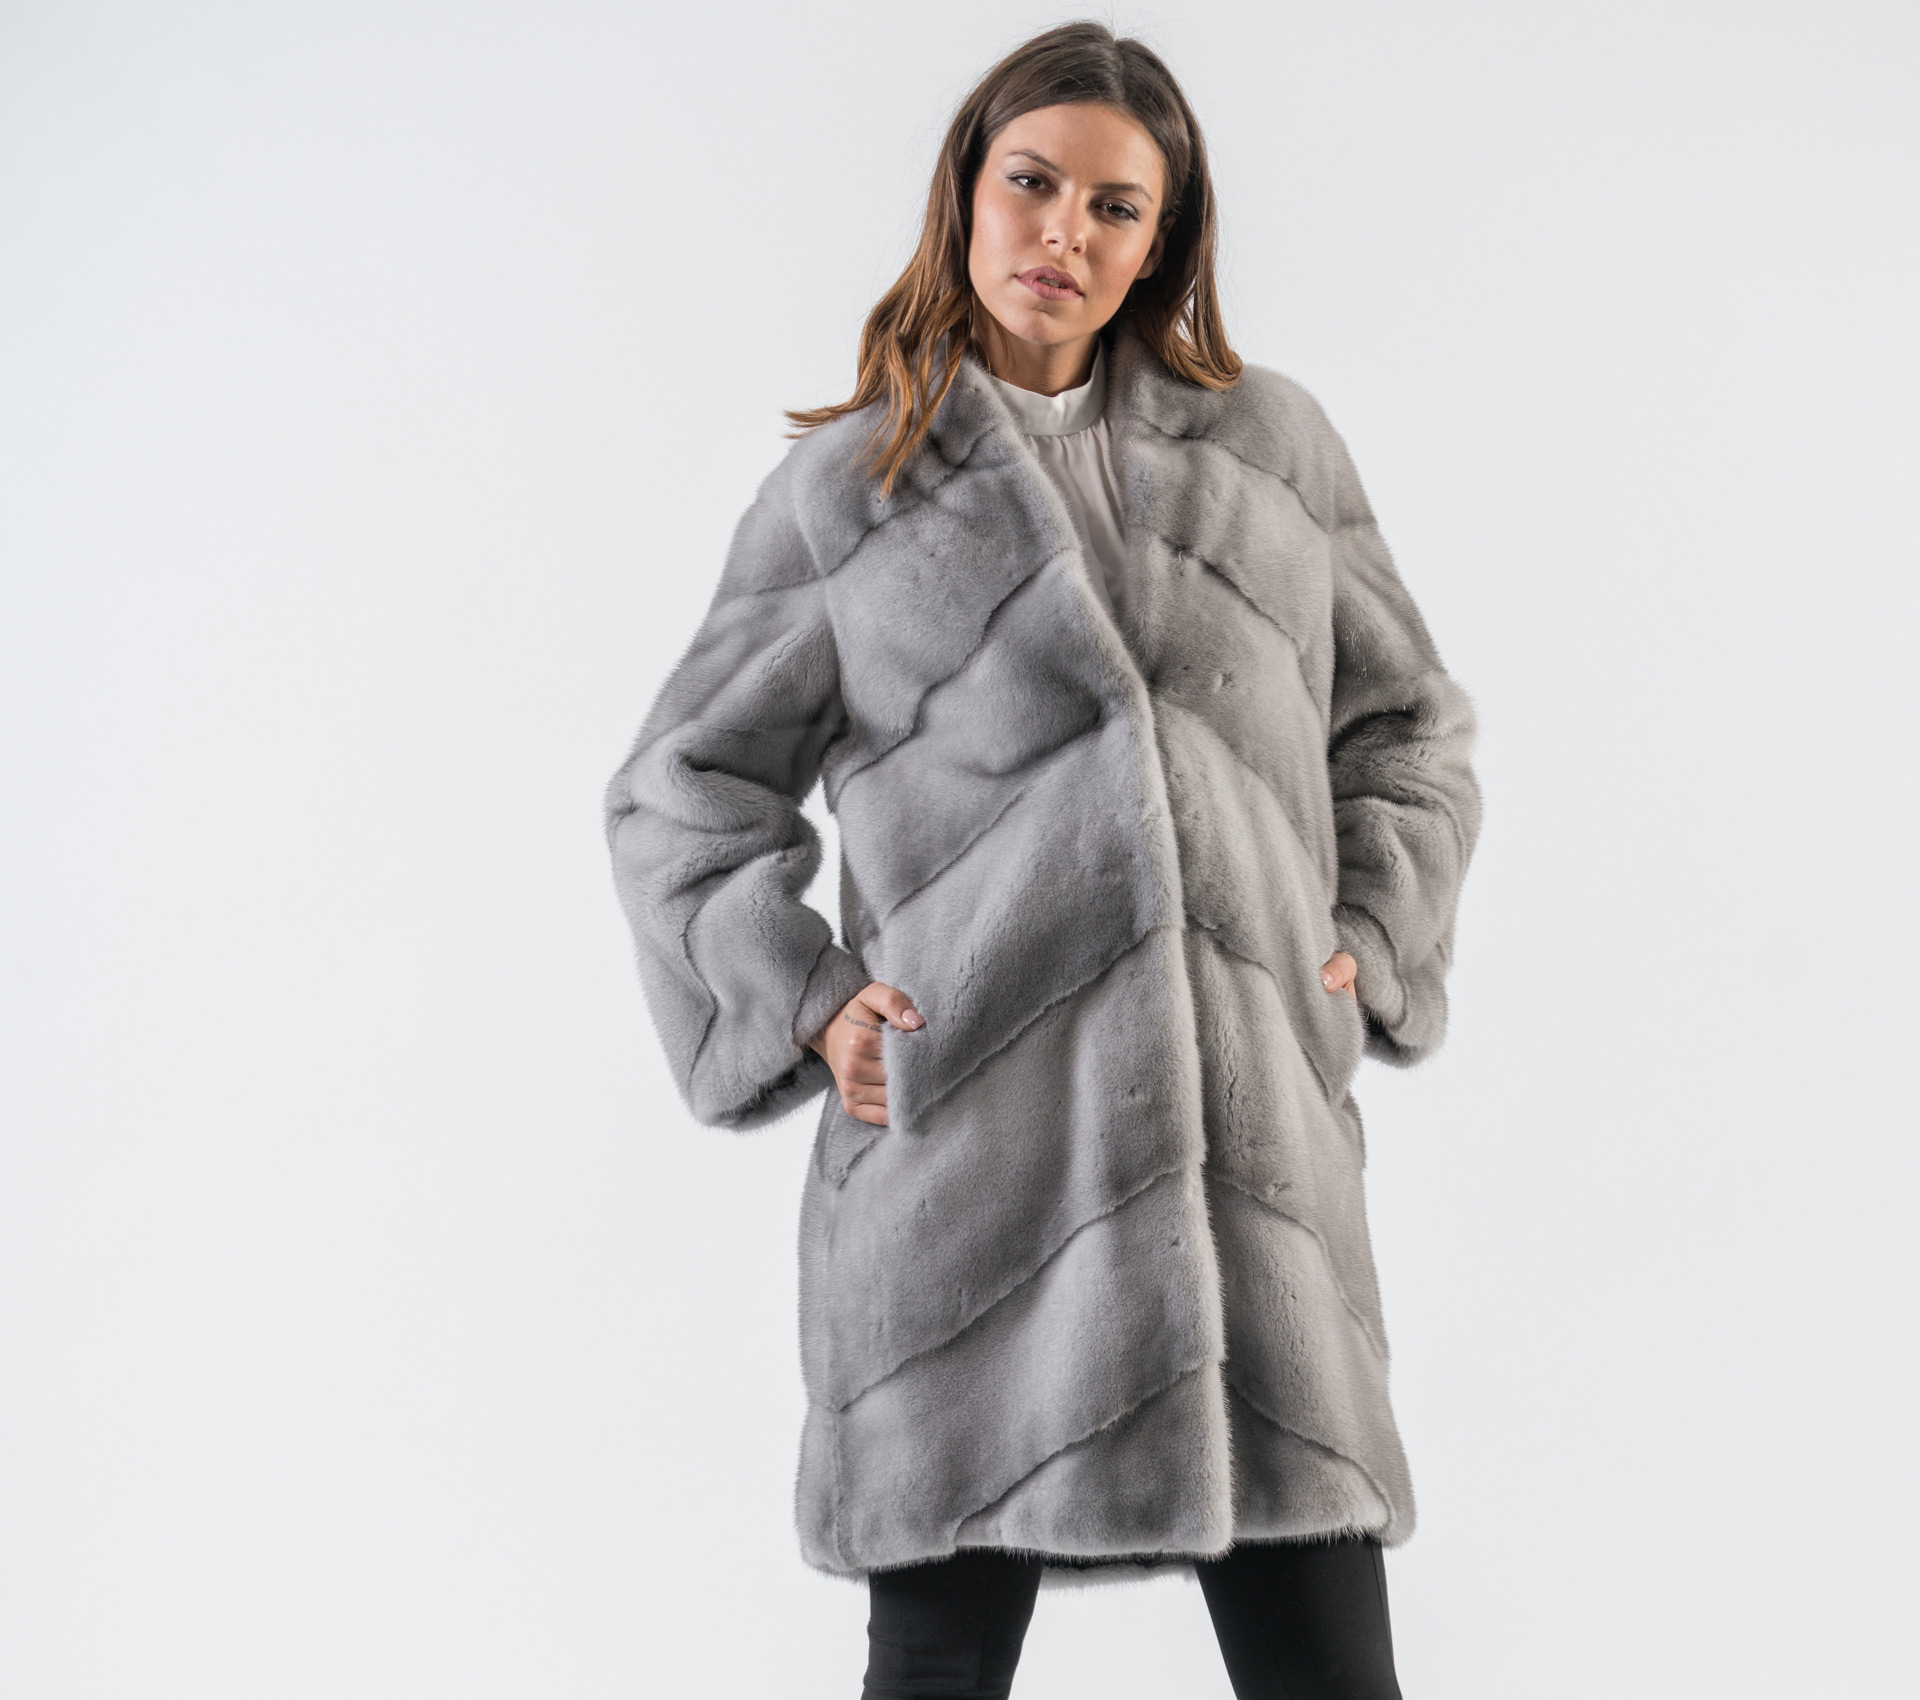 c27da9a87ba14 Sapphire Mink Fur Coat - 100% Real Fur - Haute Acorn